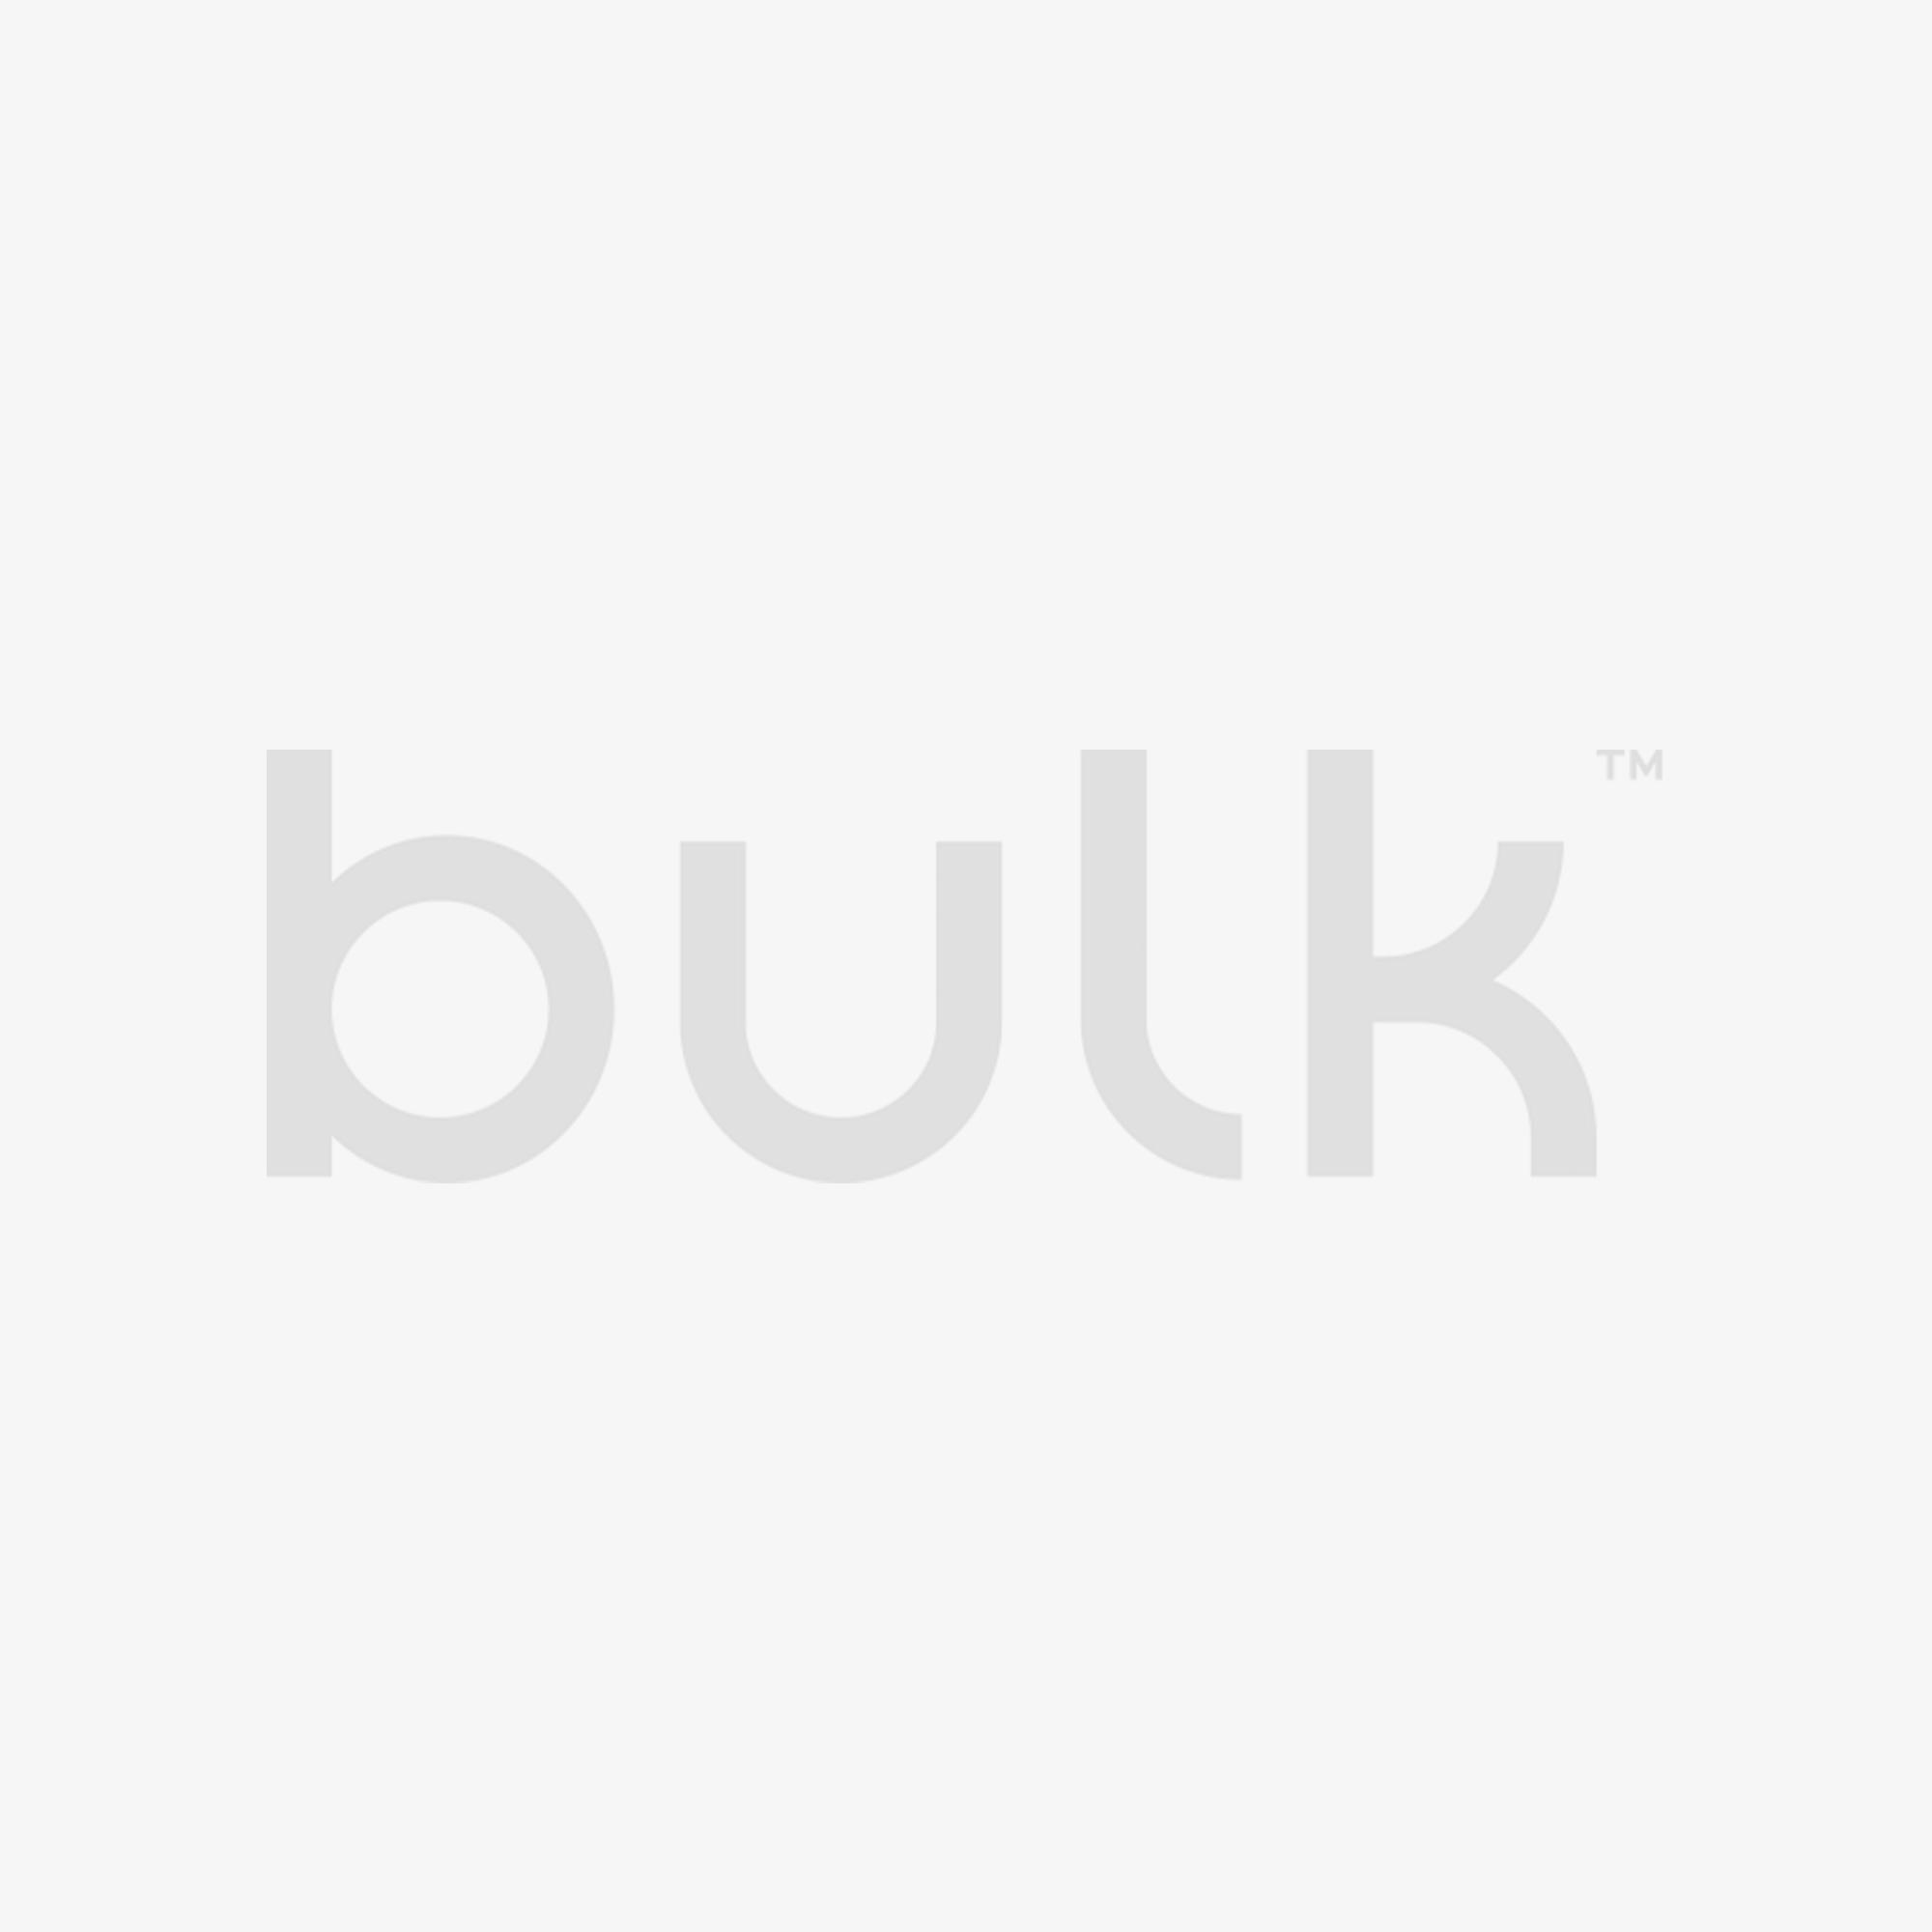 New Year Resolutions - BULK POWDERS